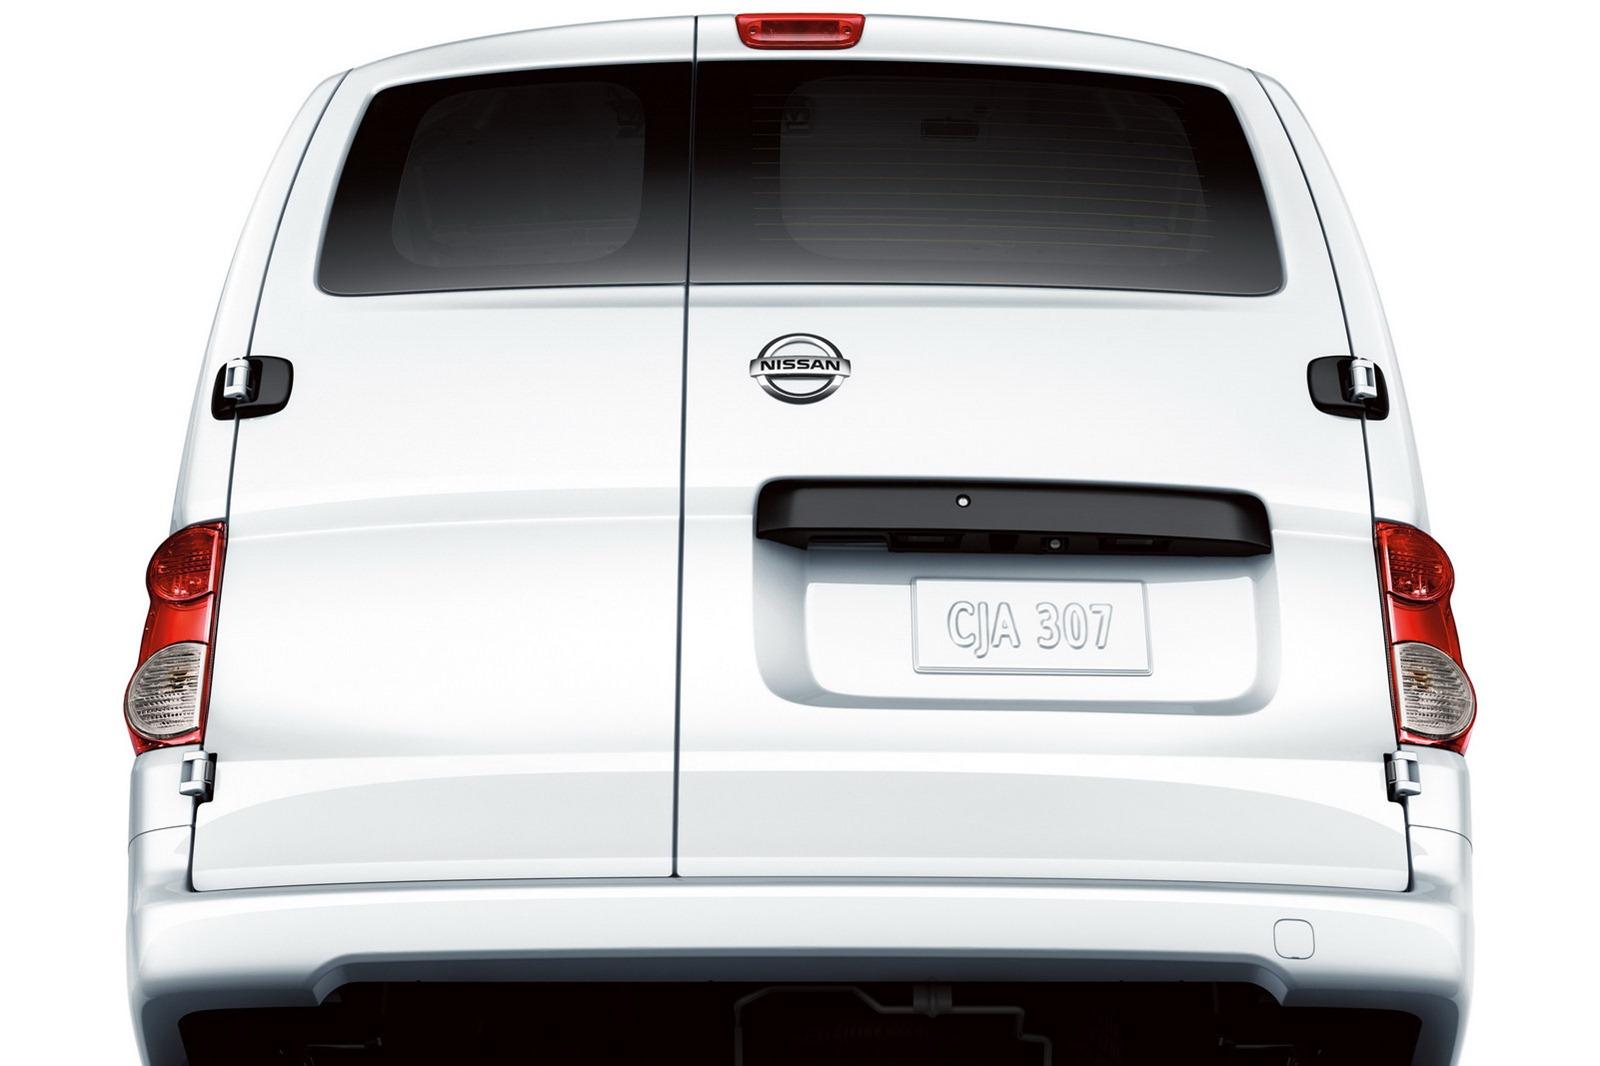 Nissan Nv200 Compact Cargo Van Debuts In Chicago